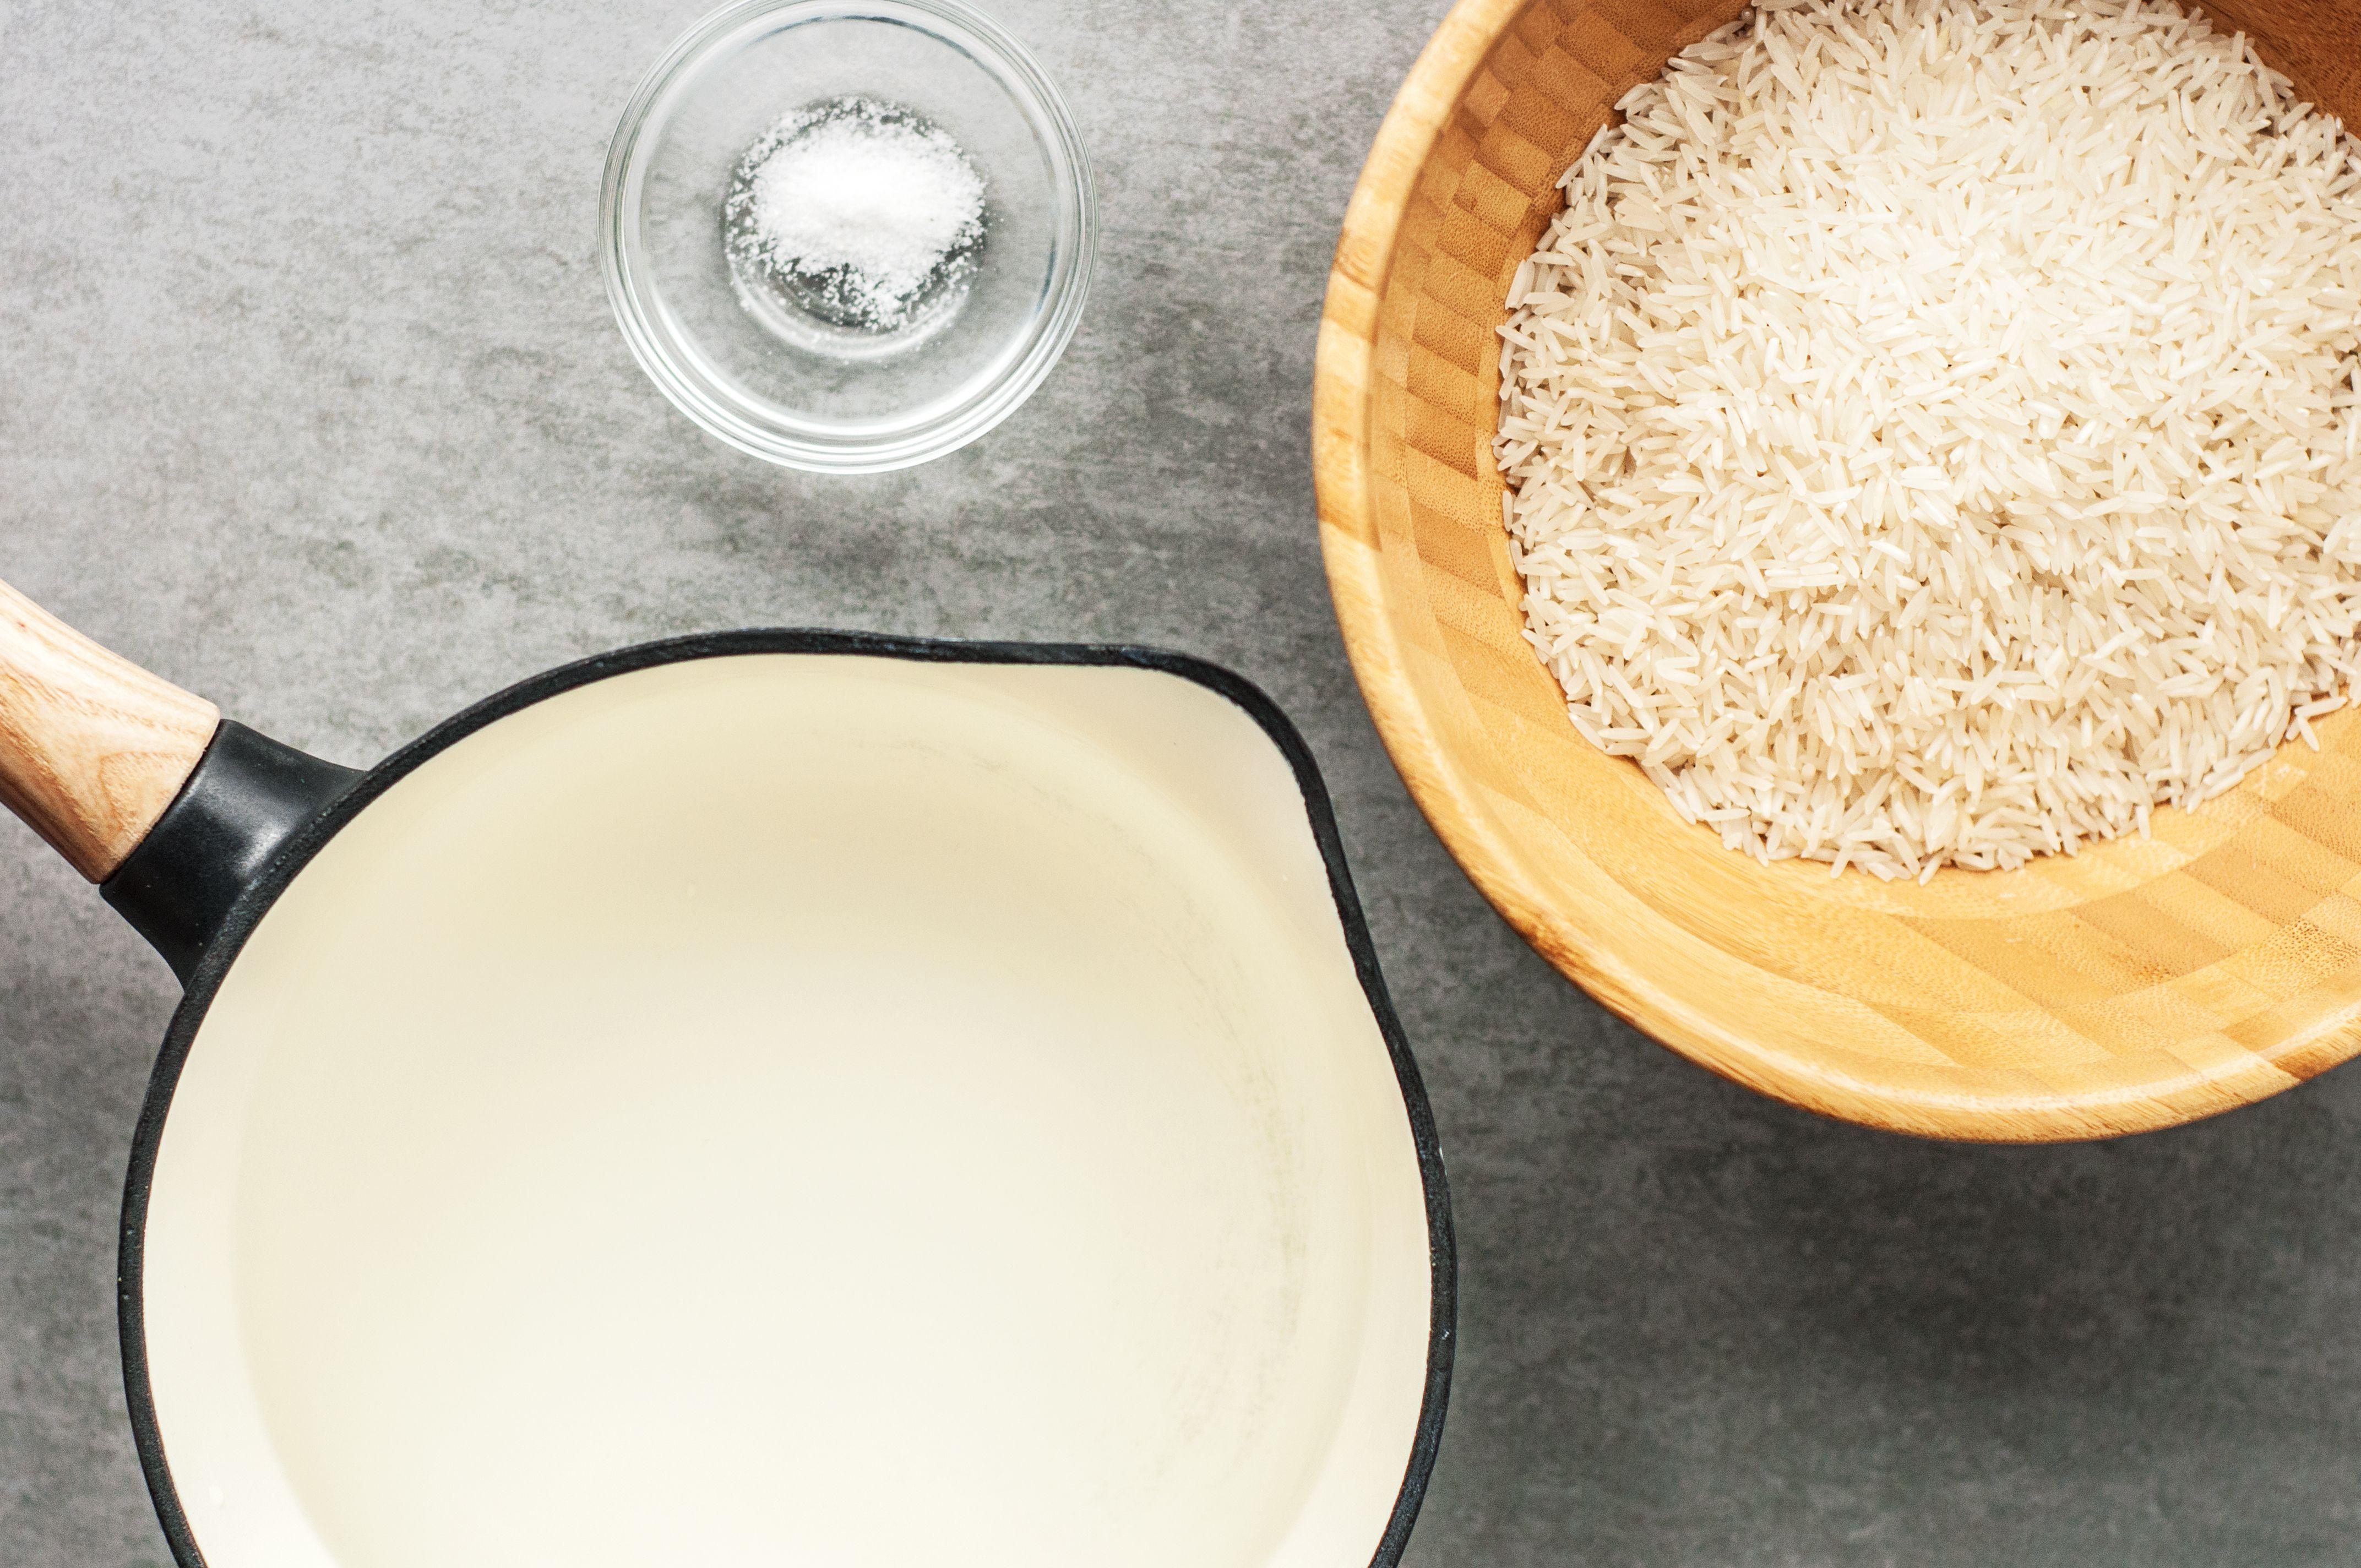 Ingredients for basic white rice